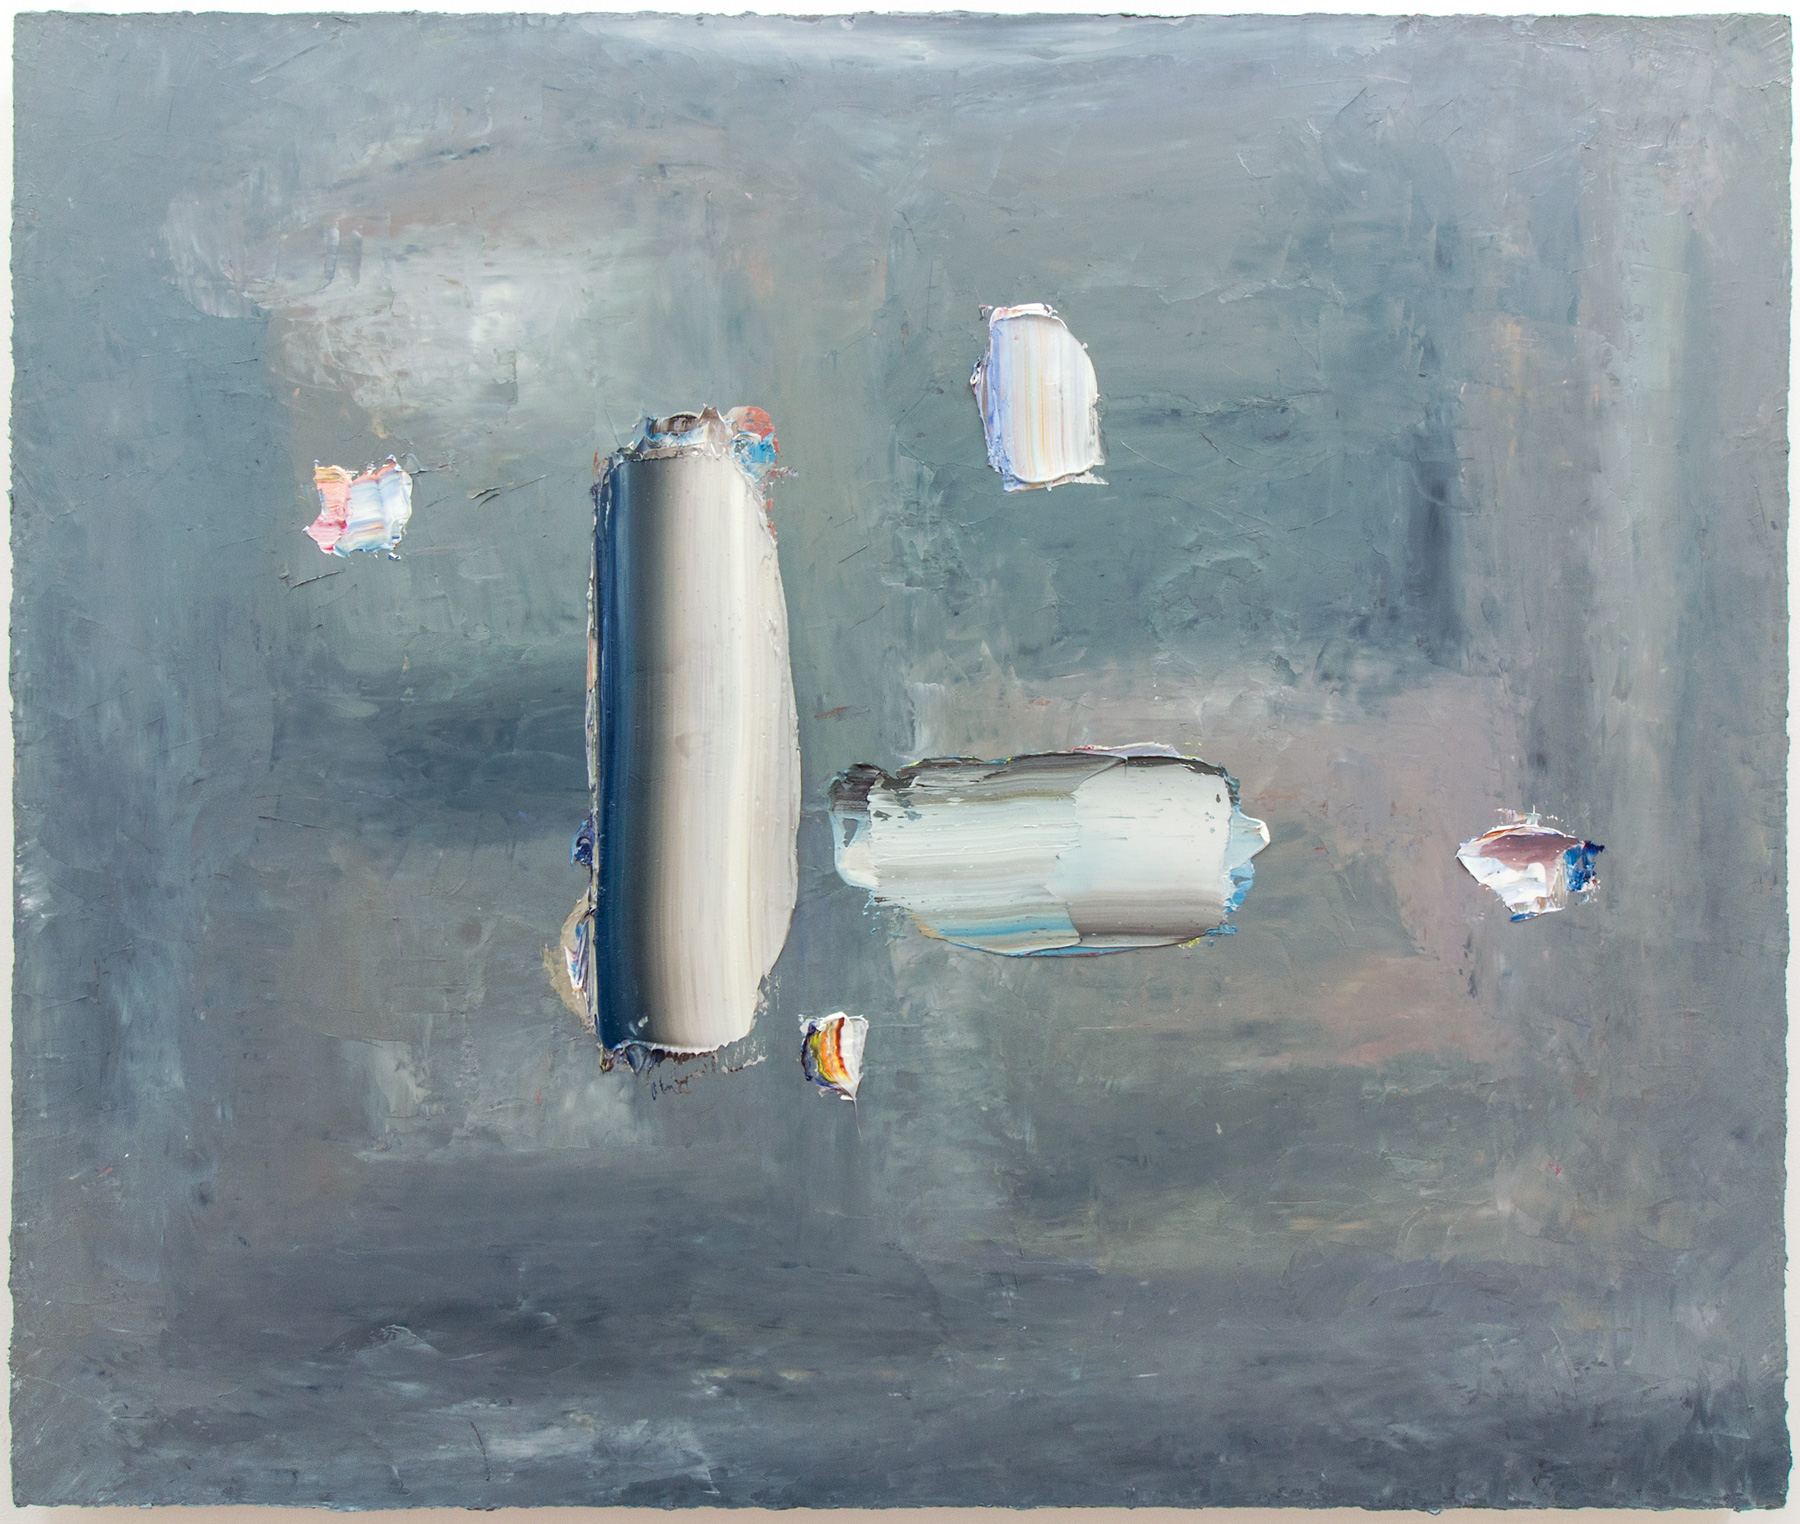 Anna Leonhardt 2017 Oil on Canvas 37 x 45 inches (94 x 114.3cm) 2018 Marc Straus Gallery